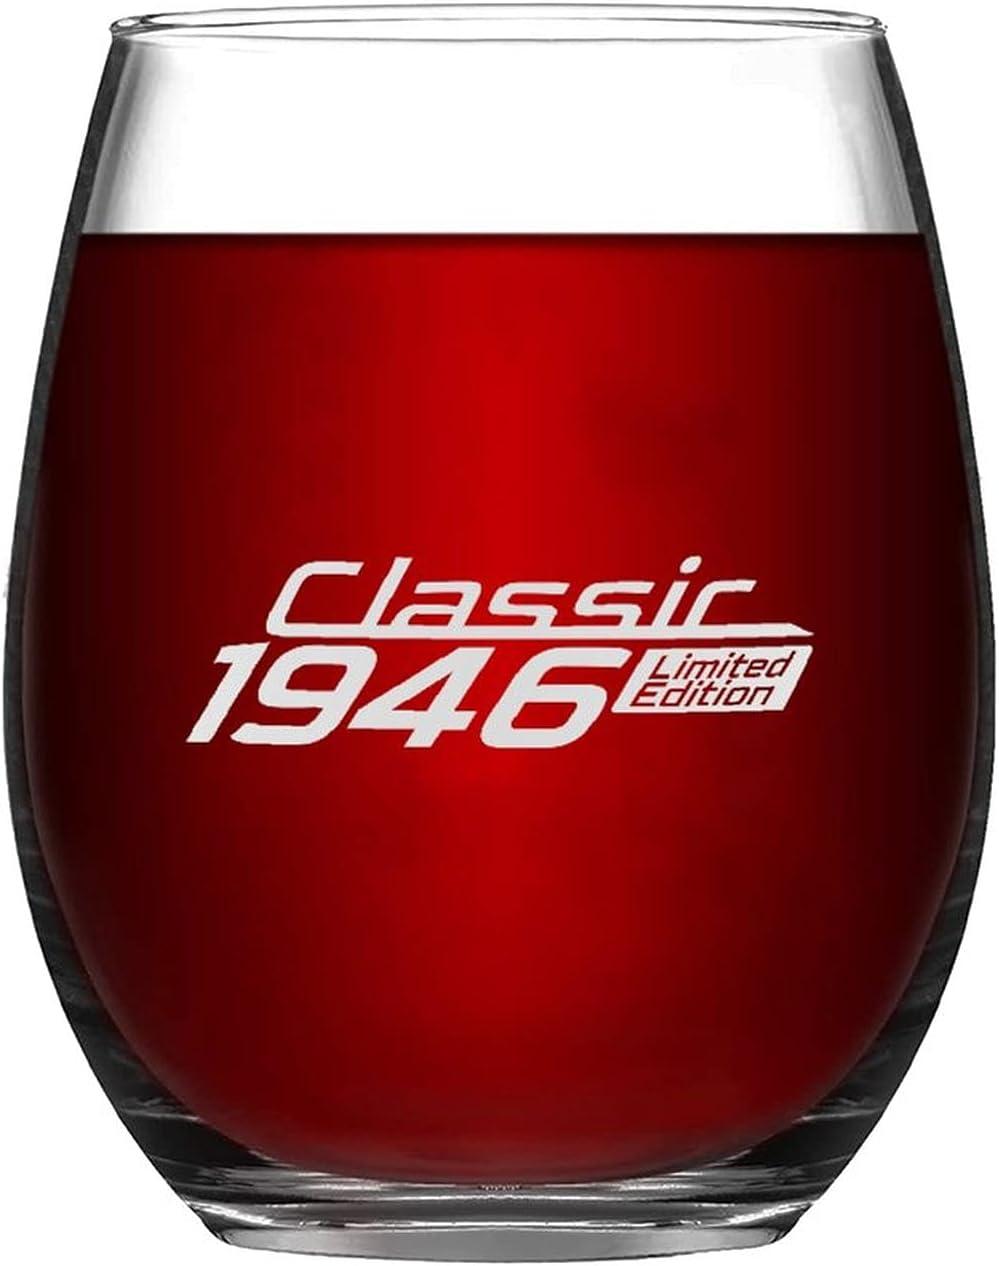 Classic Limited Edition Seasonal Wrap Introduction Popular standard 1946 Novelty Glass Mug Pres Evening Wine